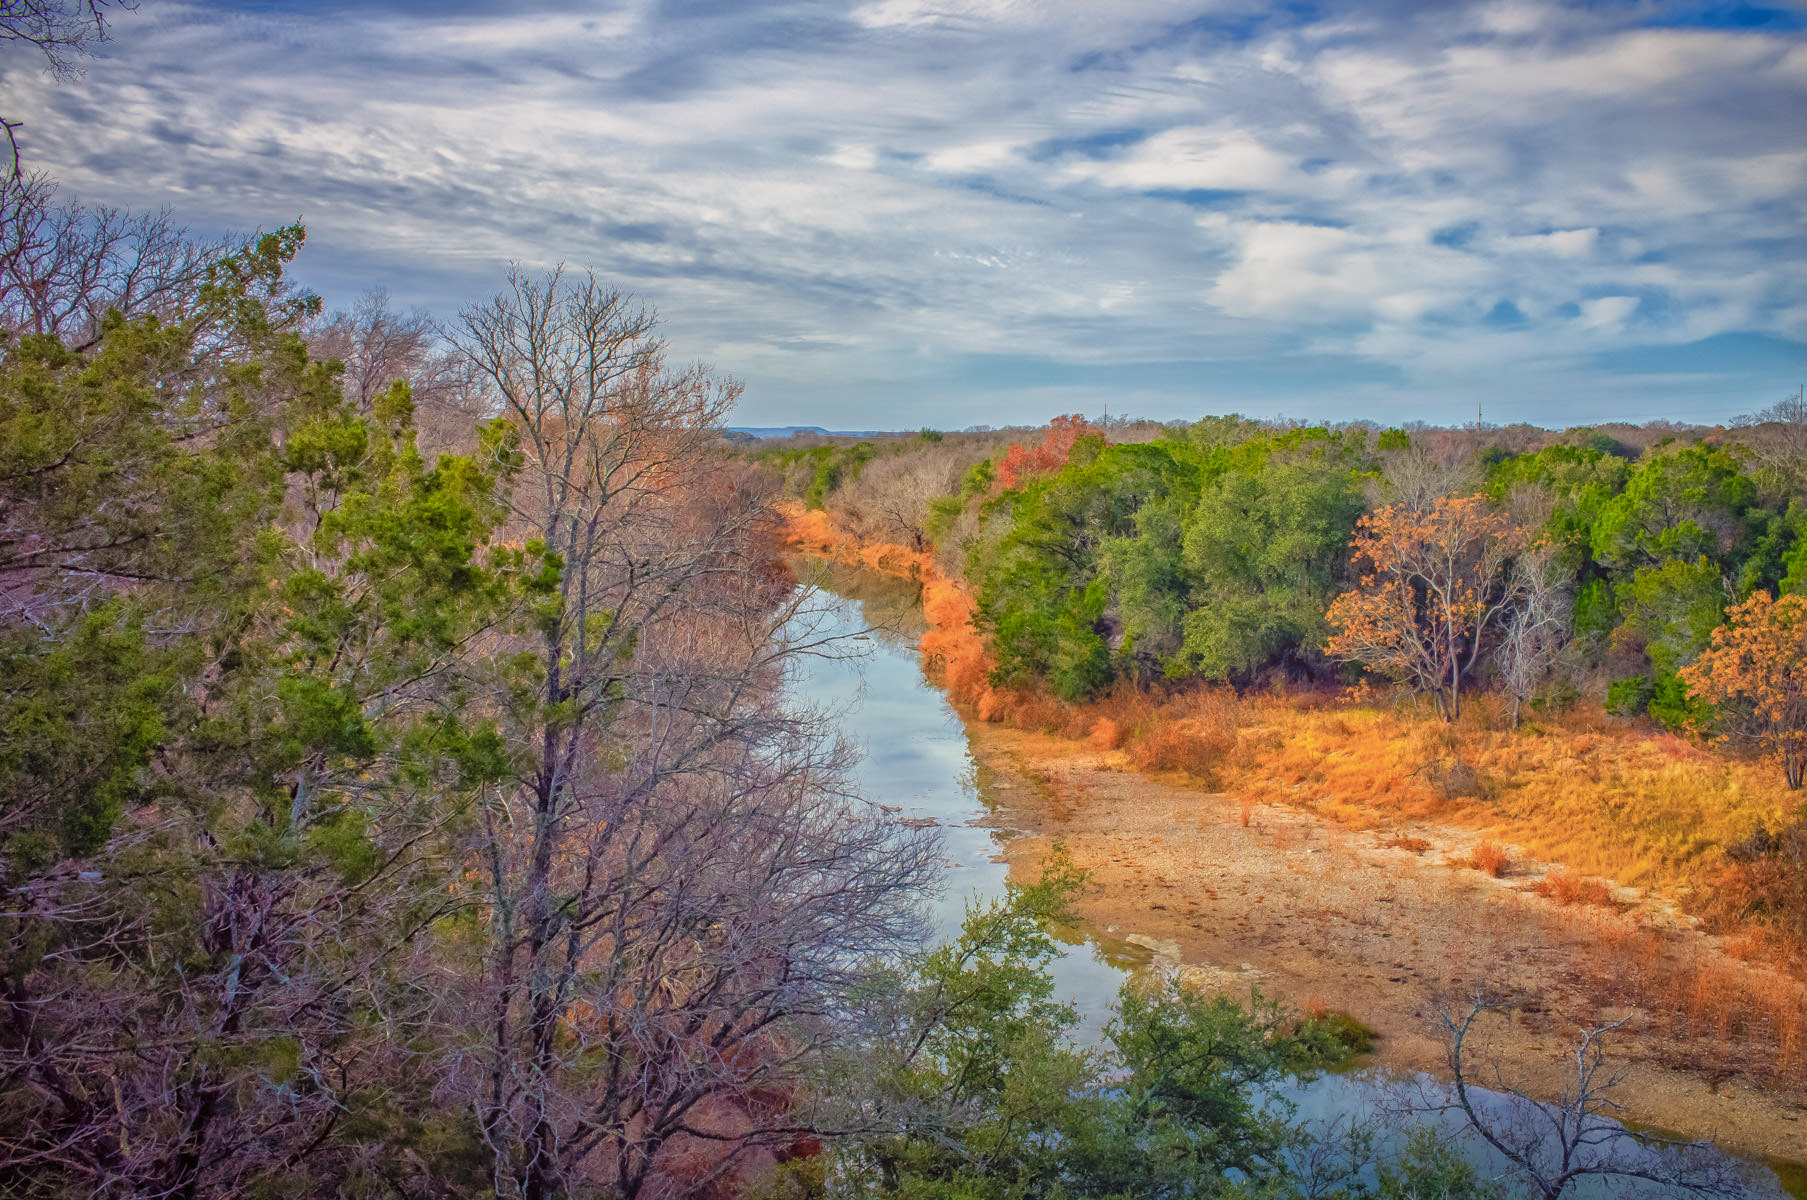 The Paluxy River snakes through Dinosaur Valley State Park near Glen Rose, Texas.